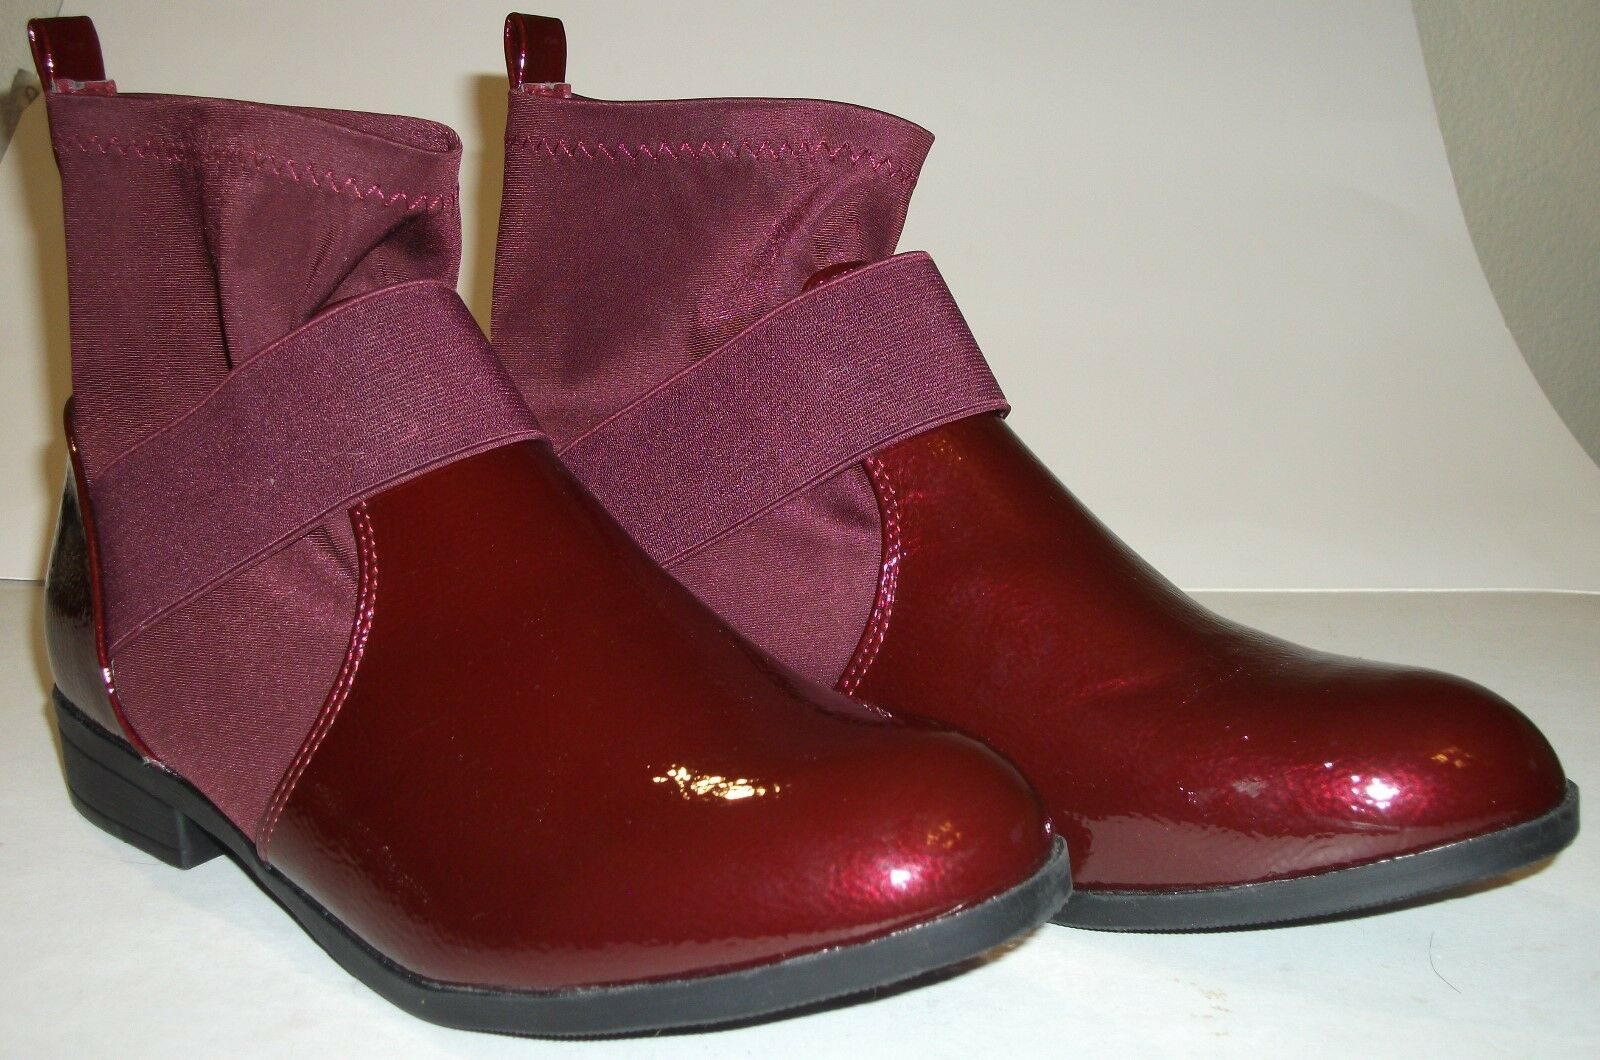 Weeboo womens Boot - Gracelynn - Size 10 - Maroon high Gloss